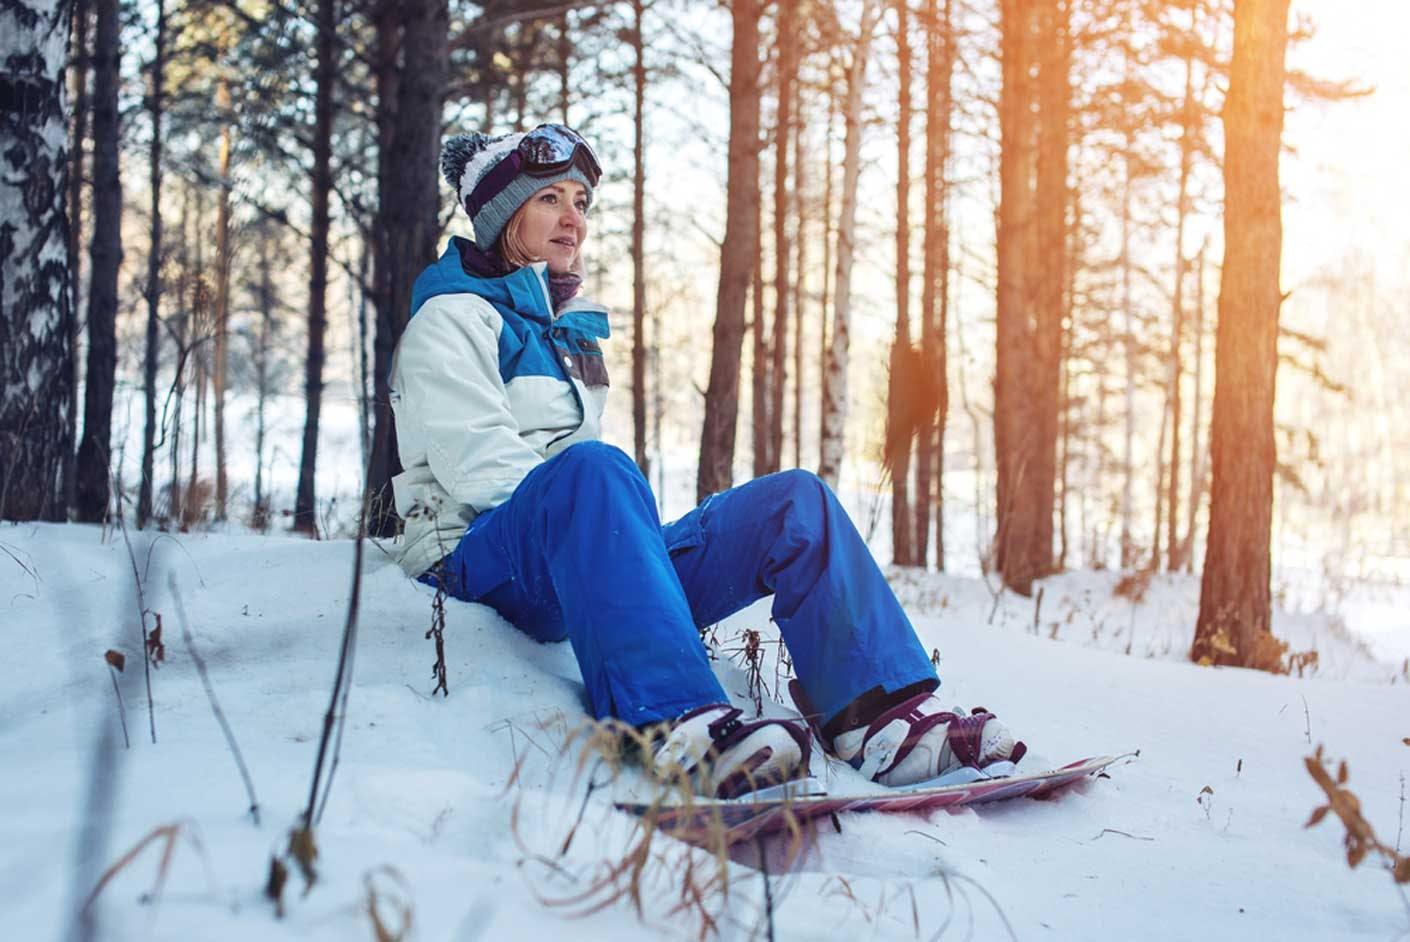 Skiunfall Erste Hilfe